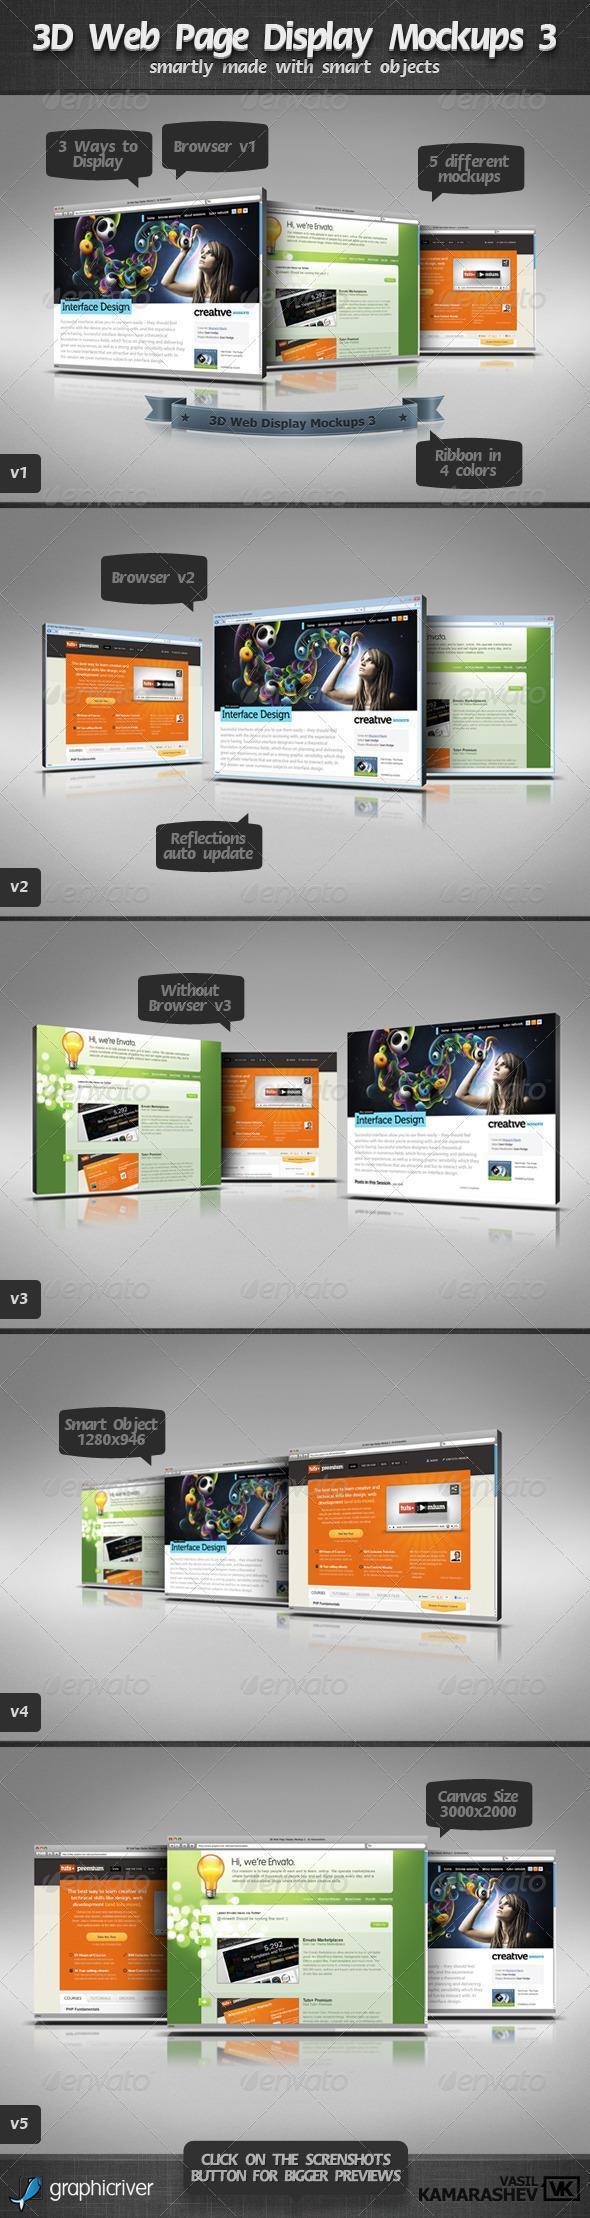 Web Page Mockup PSD